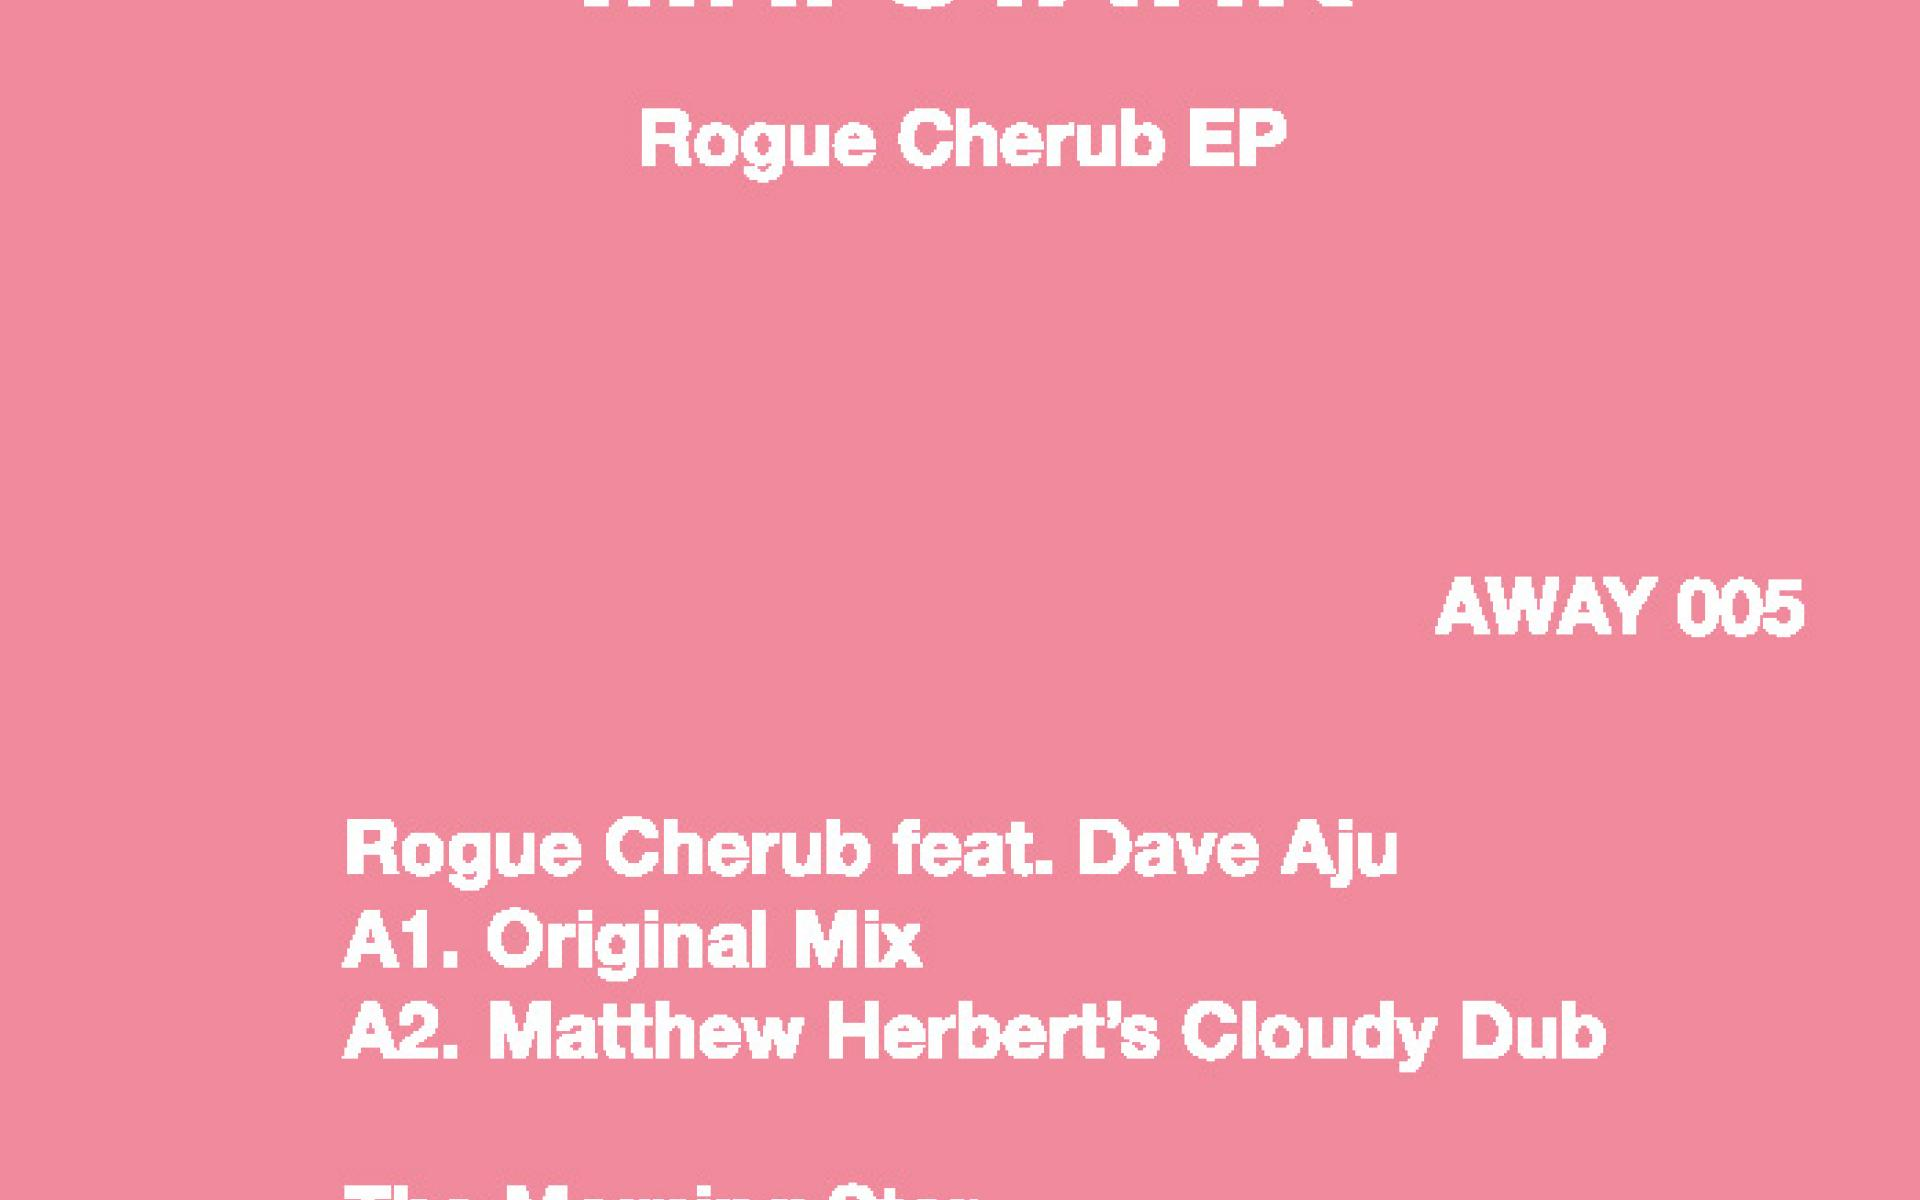 Rogue Cherub EP